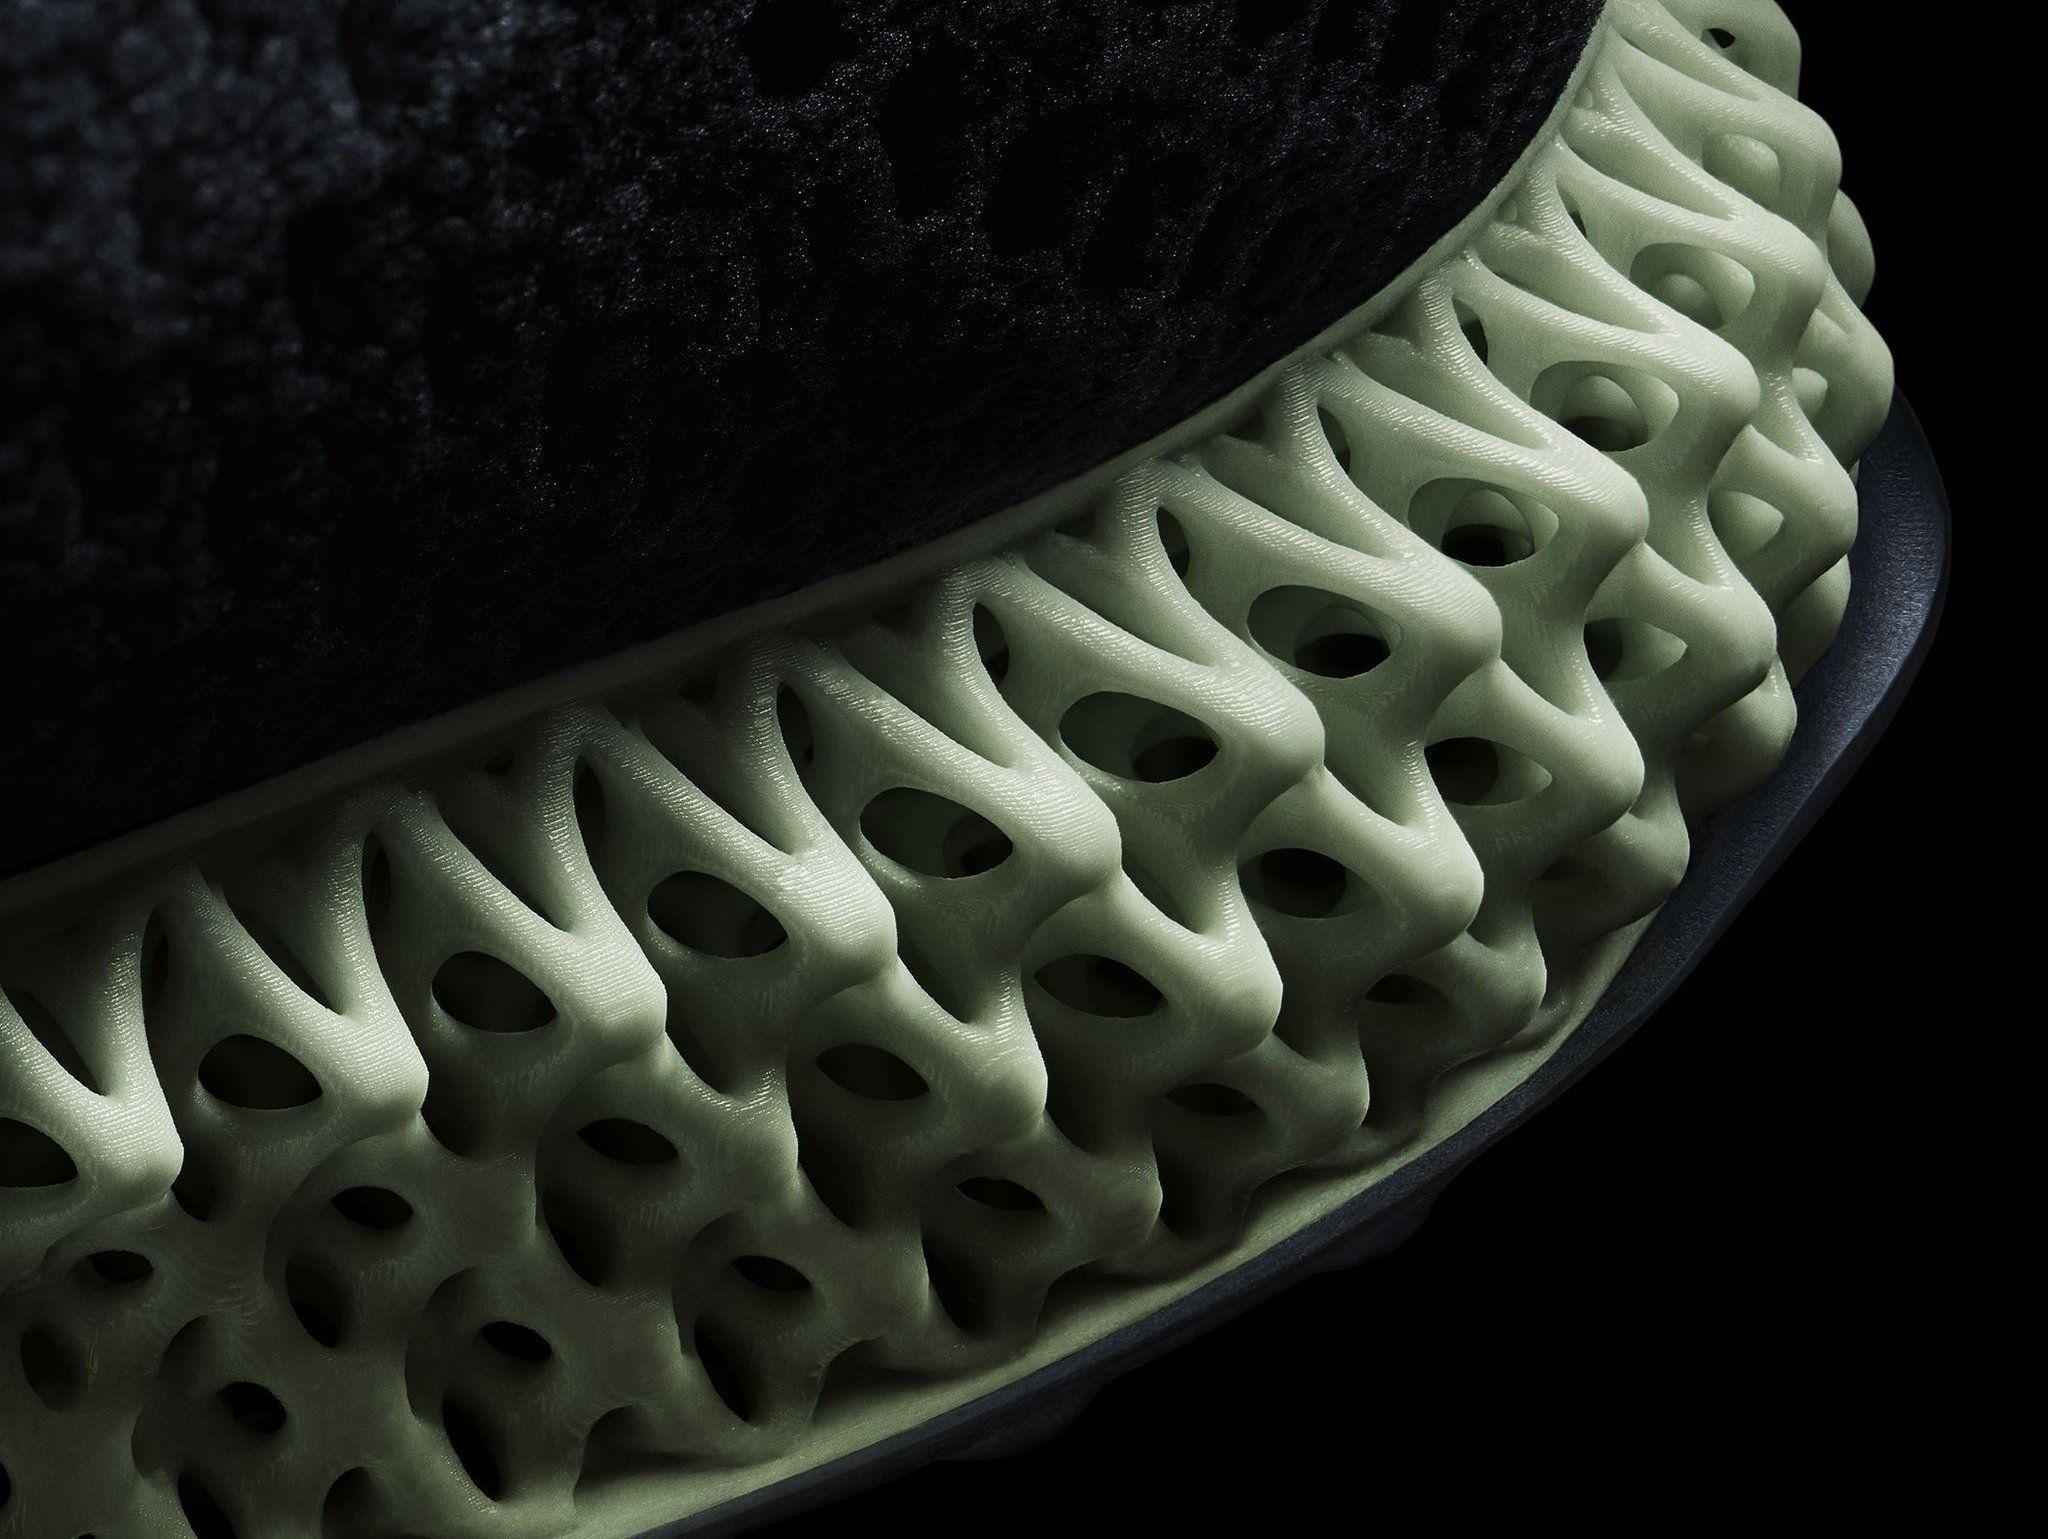 Cúal medias barba  Adidas kicks off sneakers with 3D-printed soles   3d printed shoes, Adidas,  Digital light